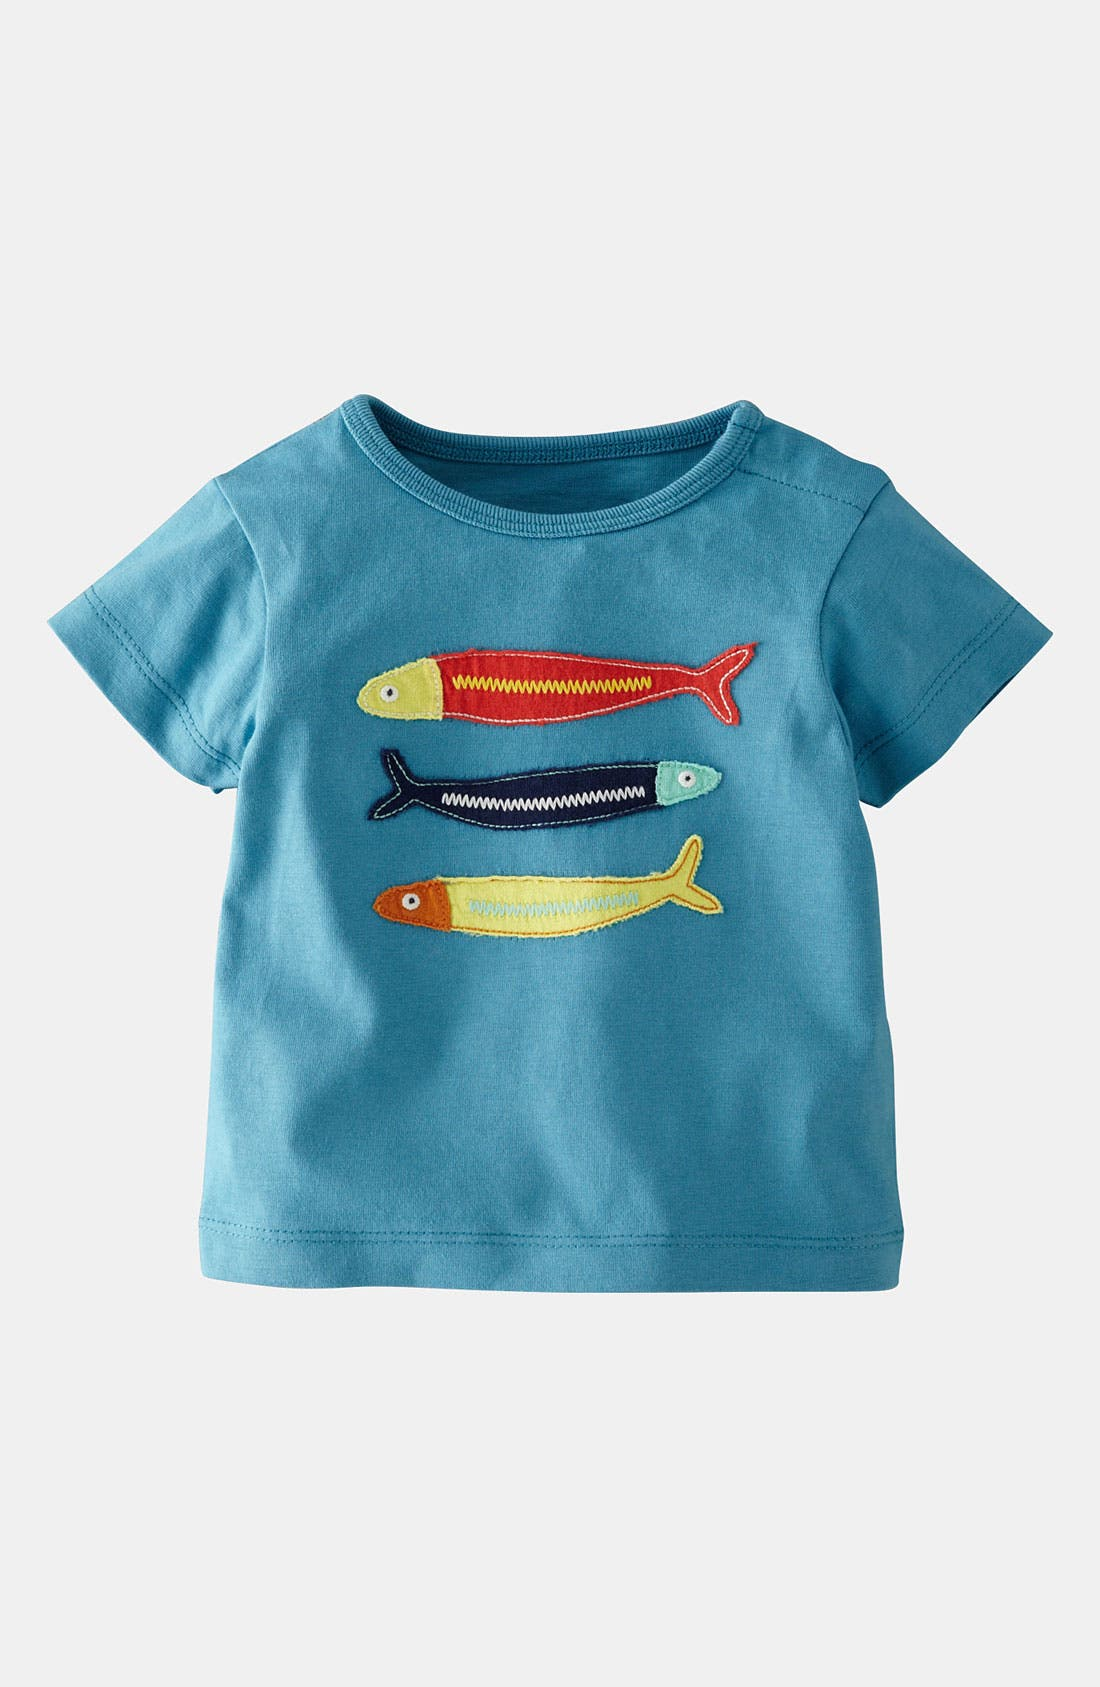 Alternate Image 1 Selected - Mini Boden 'Big Appliqué' T-Shirt (Infant)